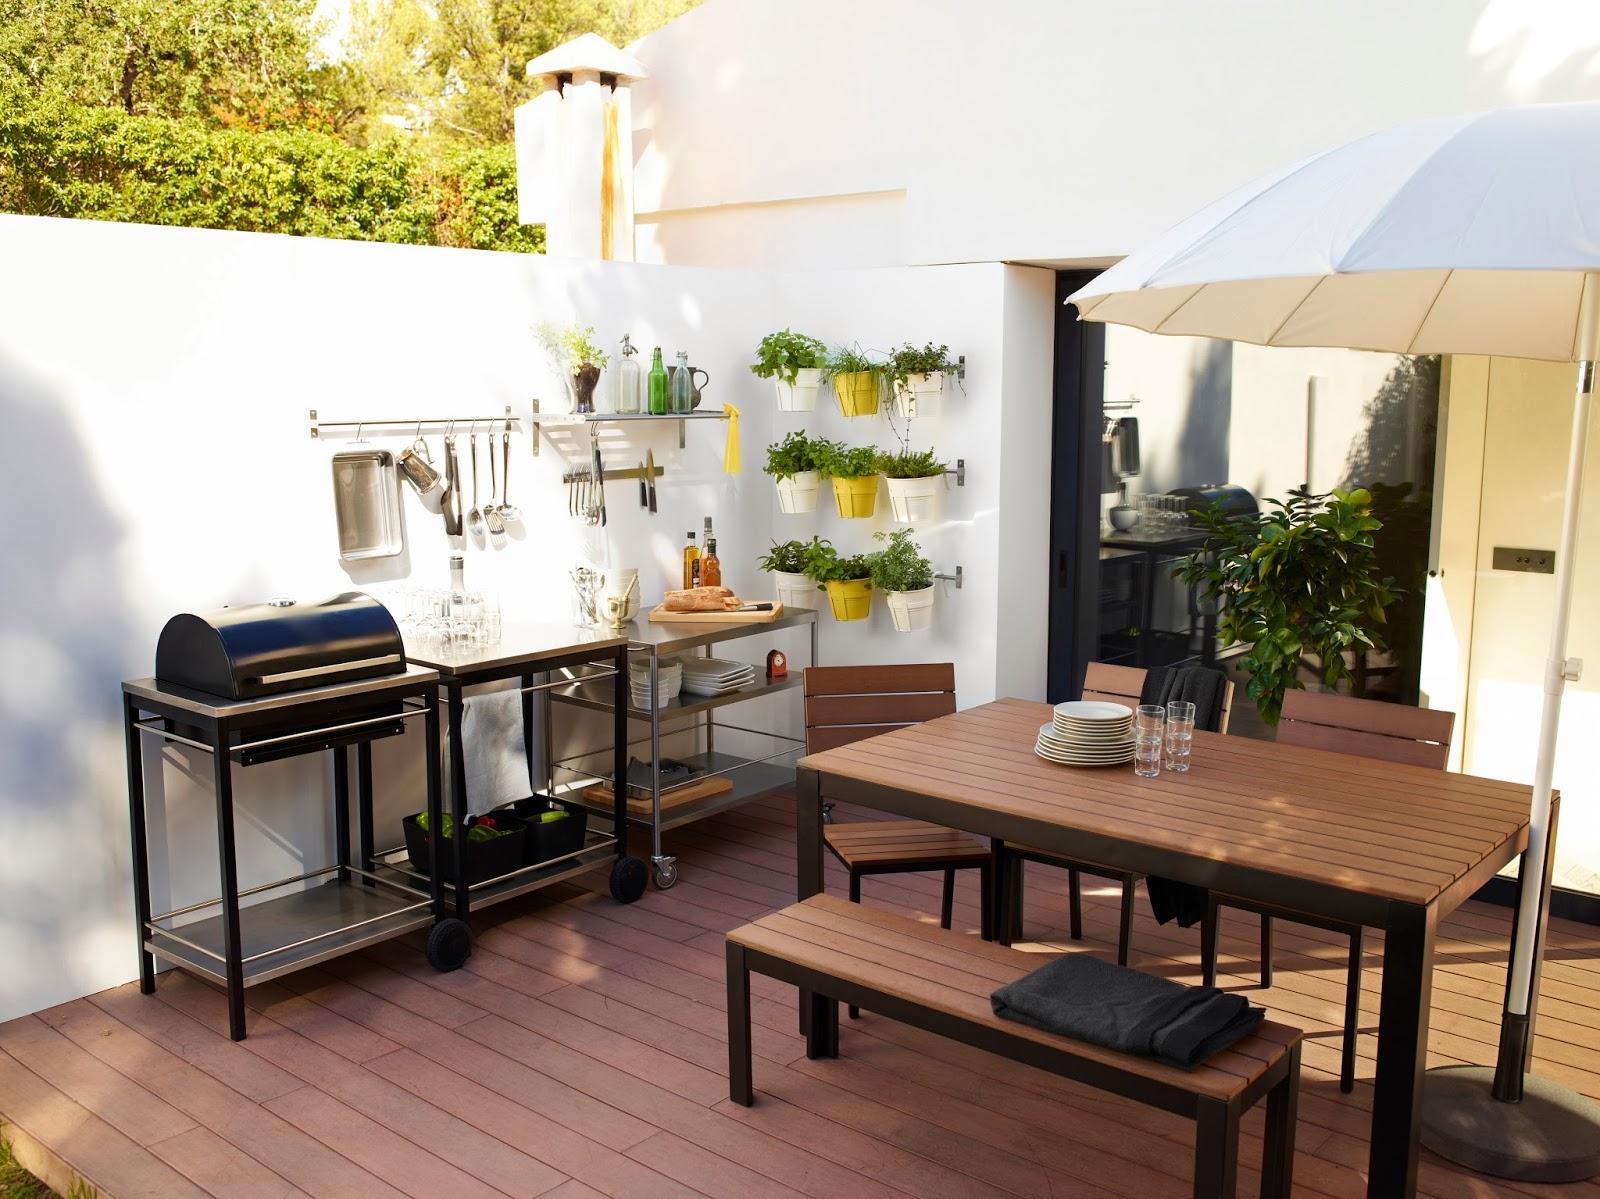 Colecci n primavera 2014 de ikea el bungalow for Sillas de exterior ikea